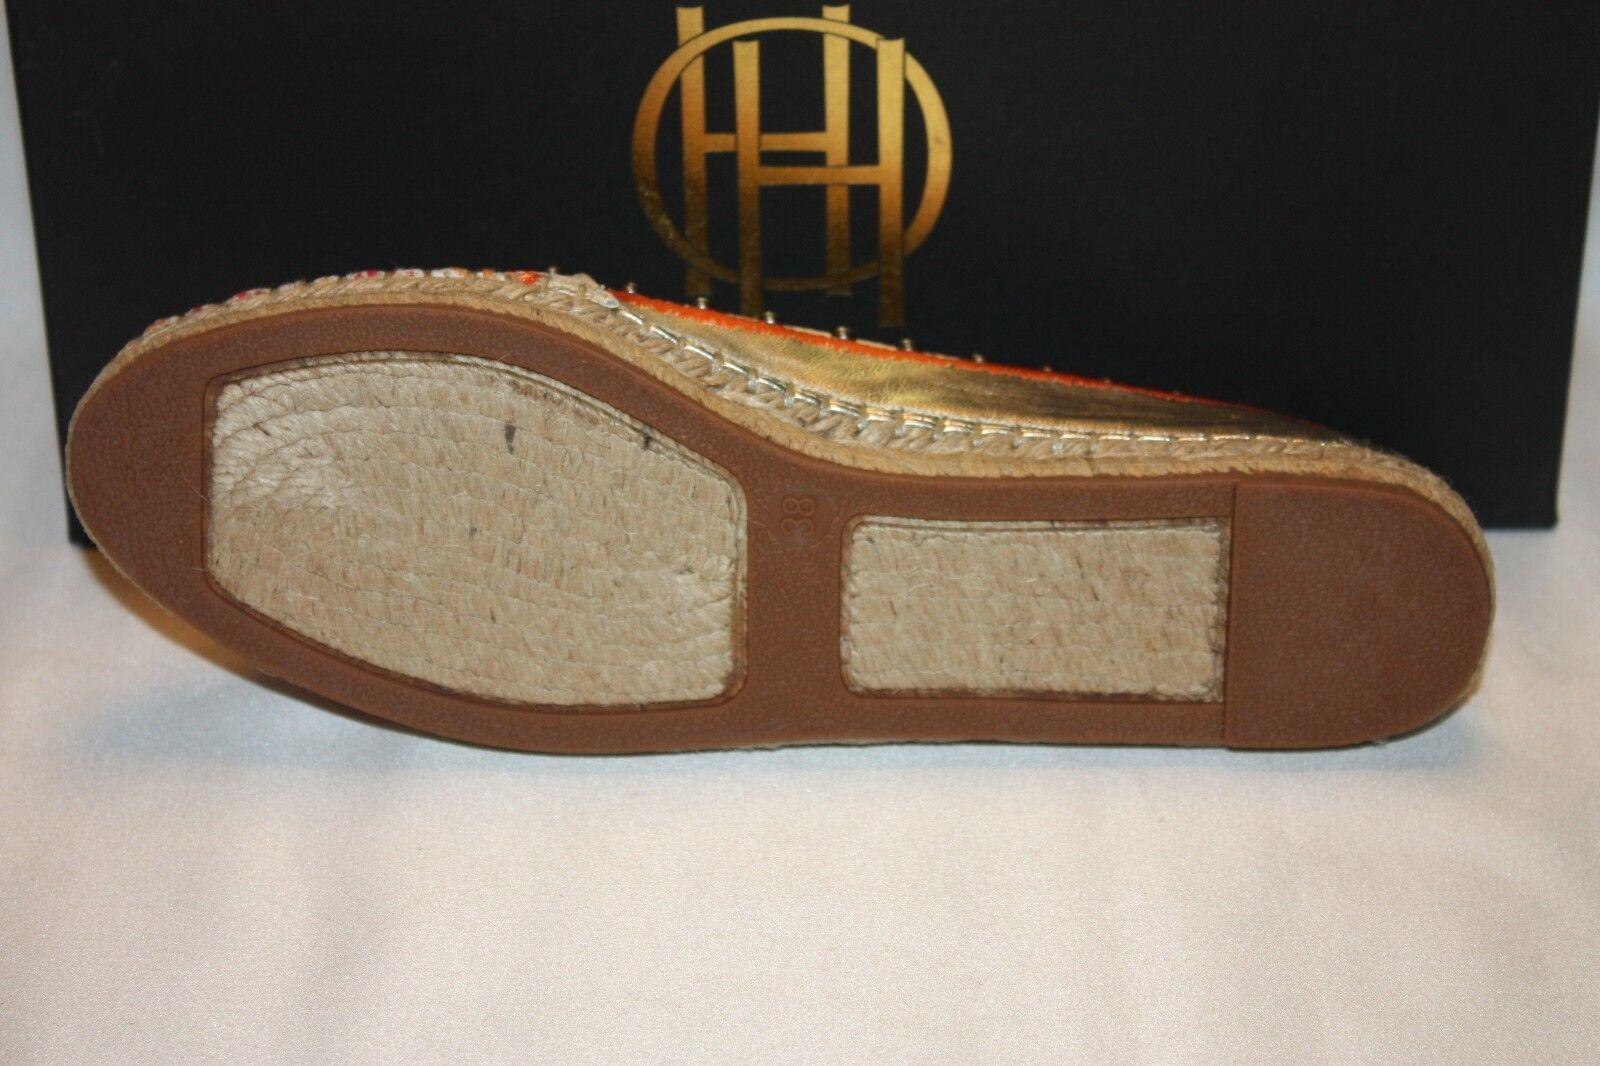 Delightful Christian Louboutin Exagona Glittering Platform Heels Crisscross Heels Platform 39.5 d4d221